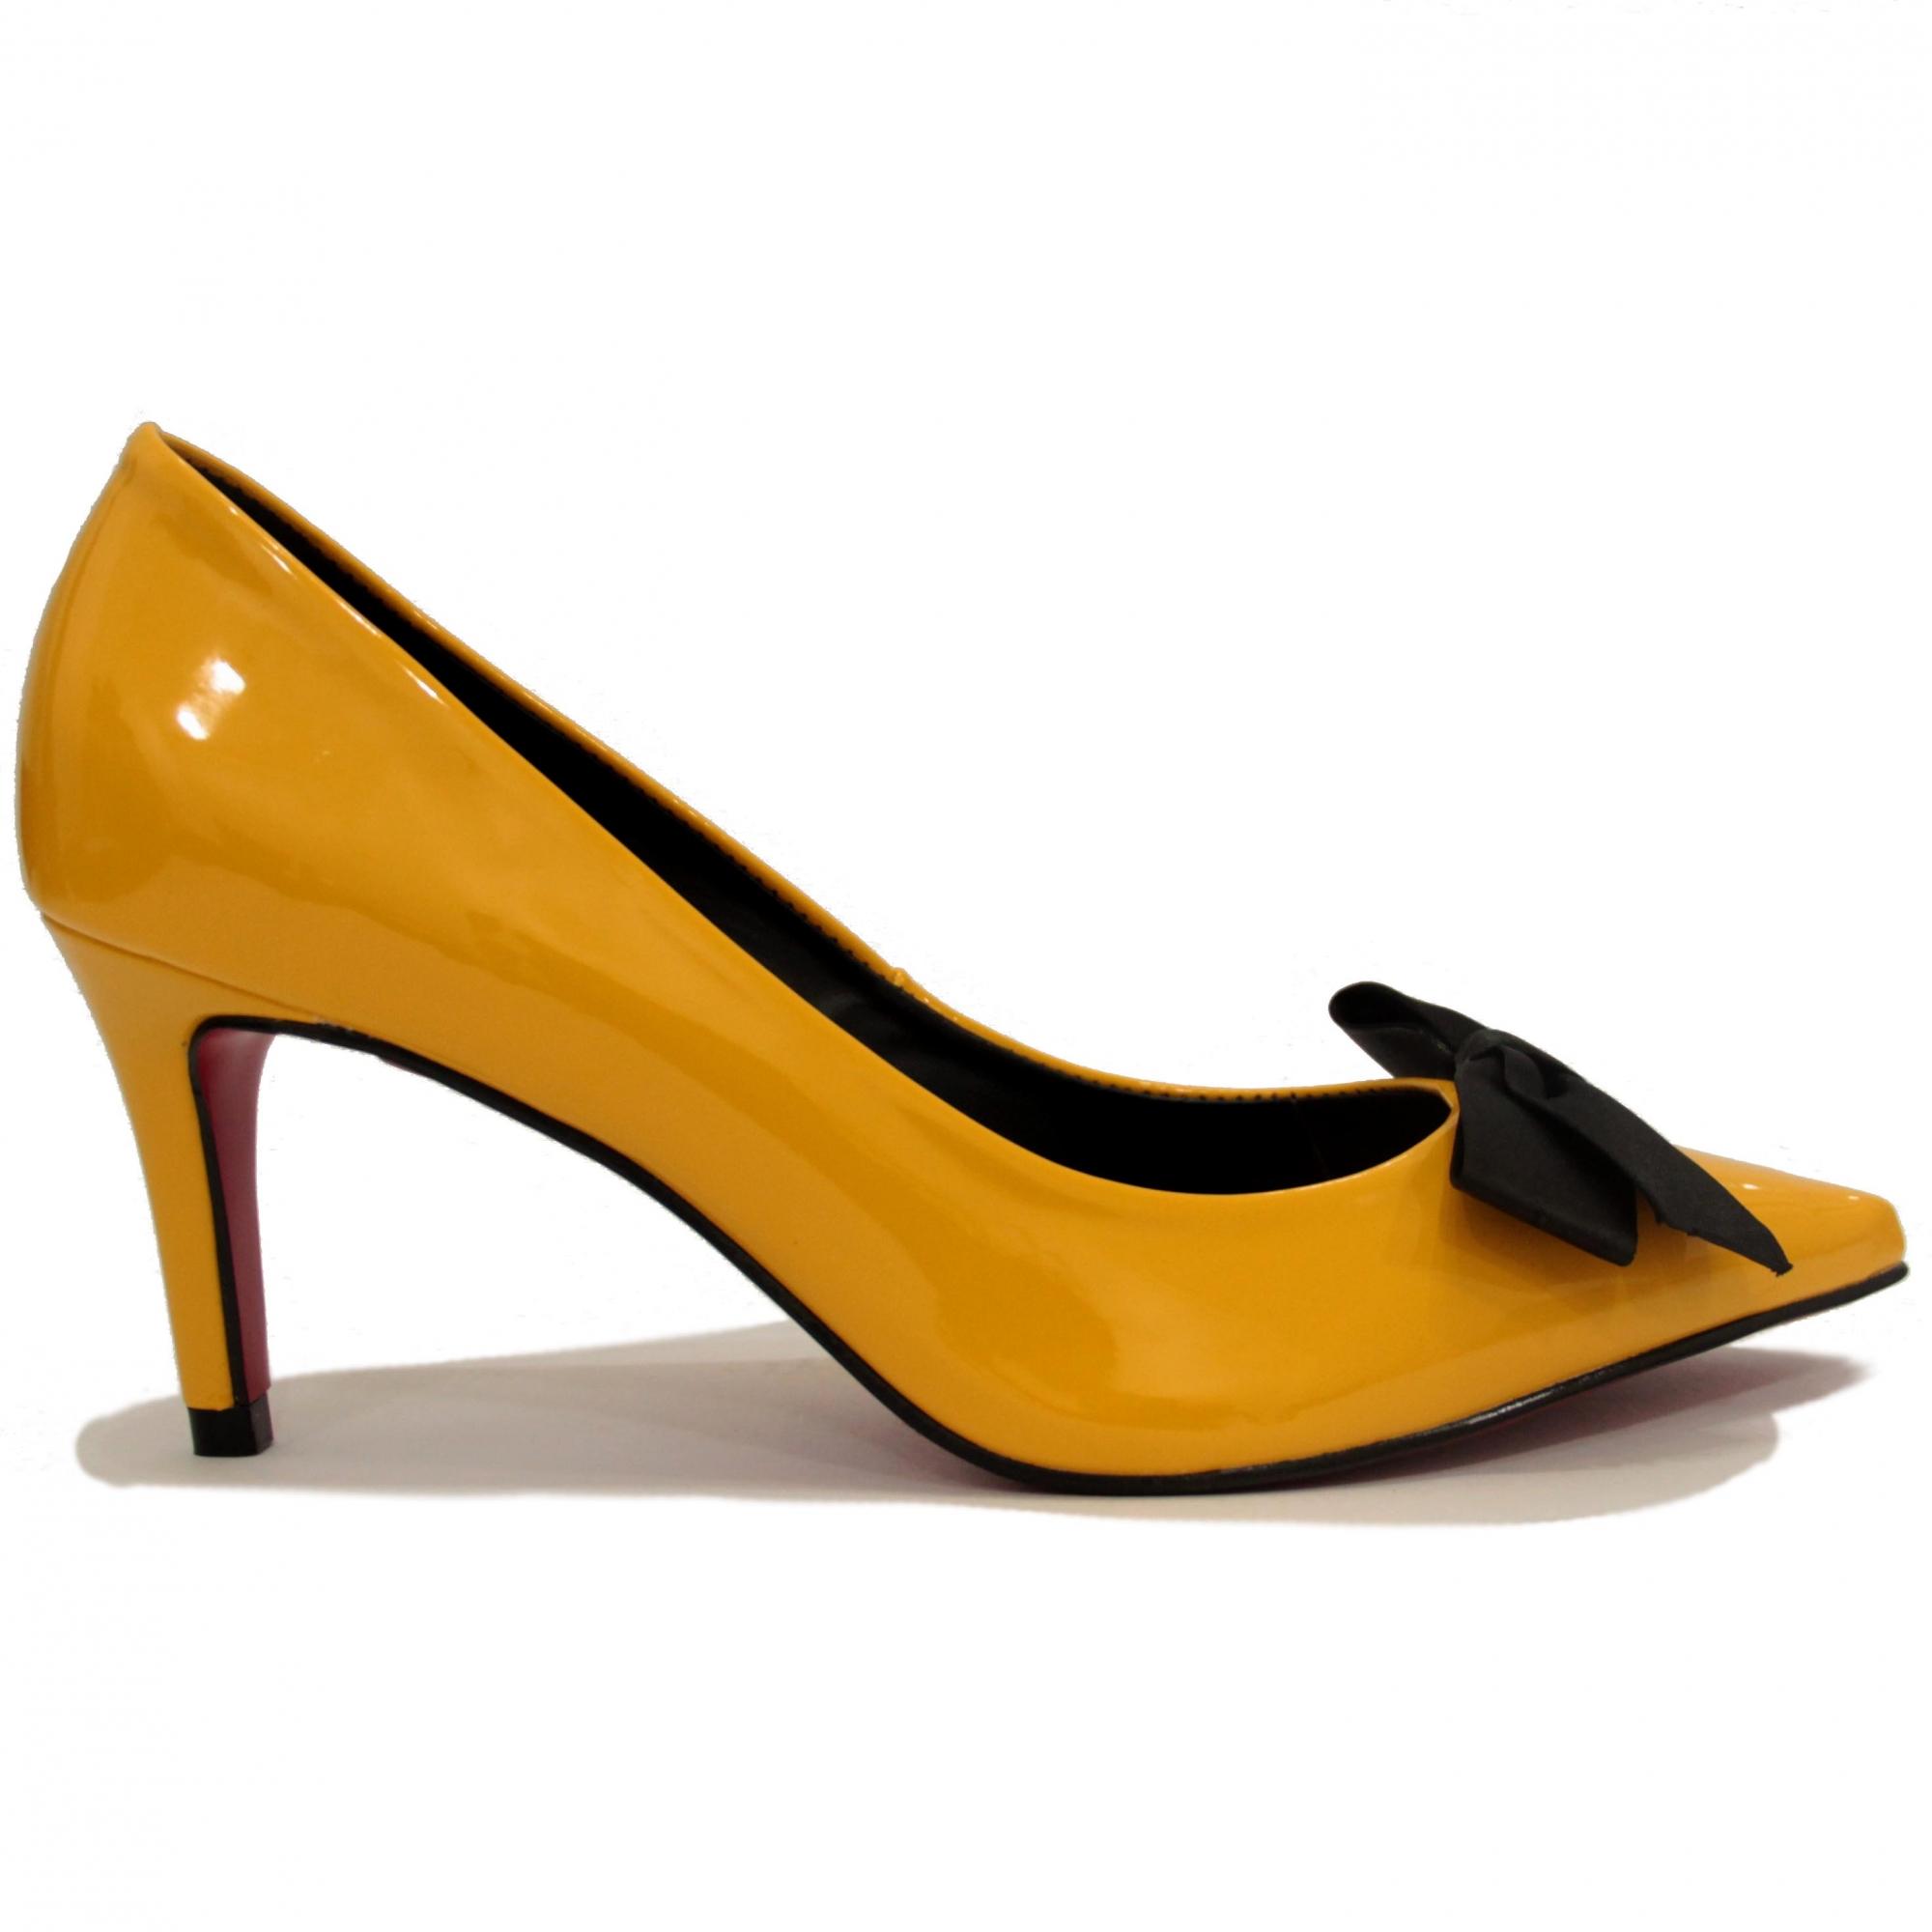 Pré Venda - Scarpin Charlotte Amarelo Salto Baixo Deborah Munhoz